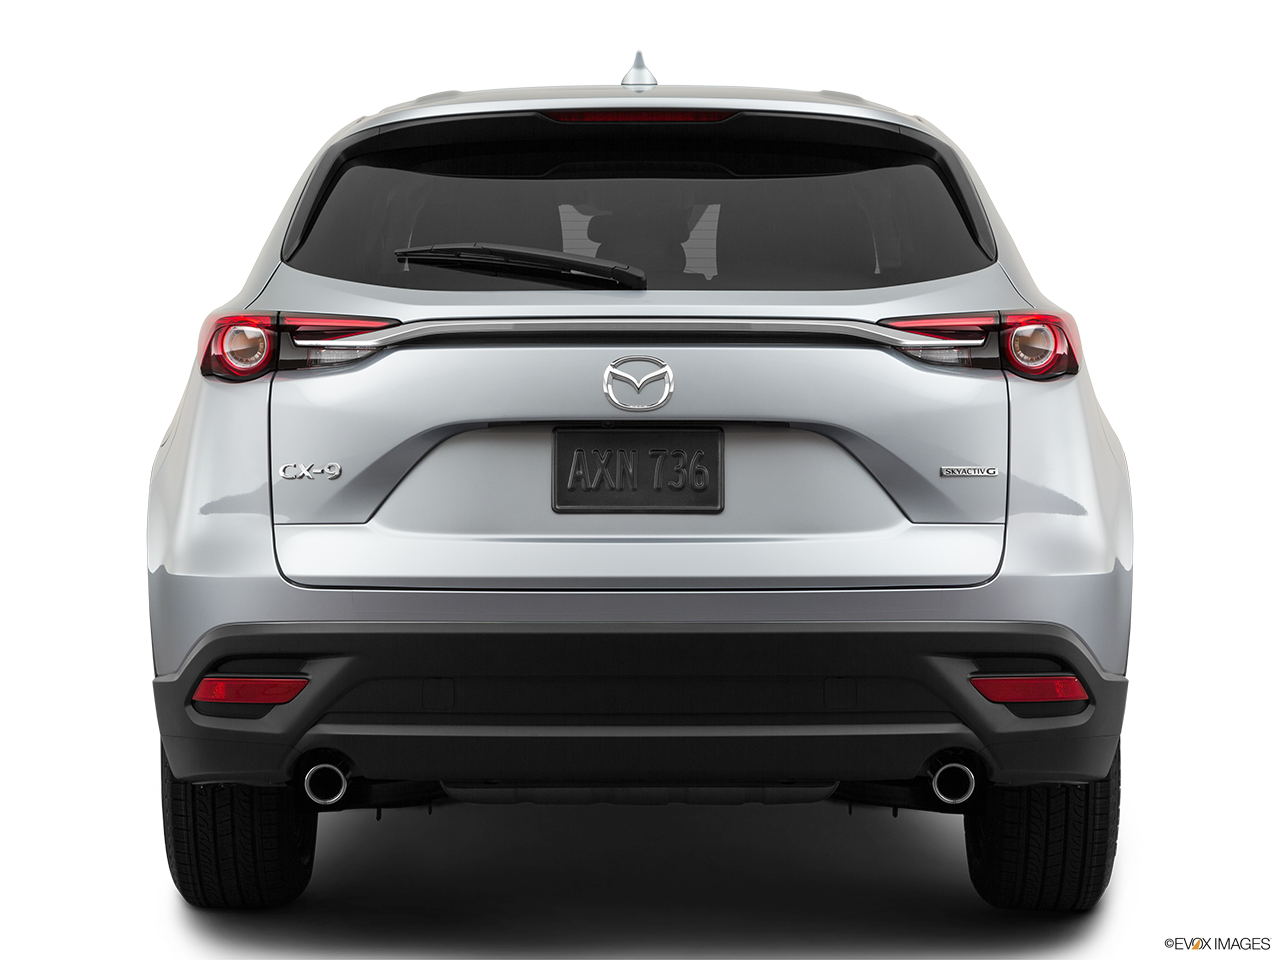 2021 Mazda CX-9 photo